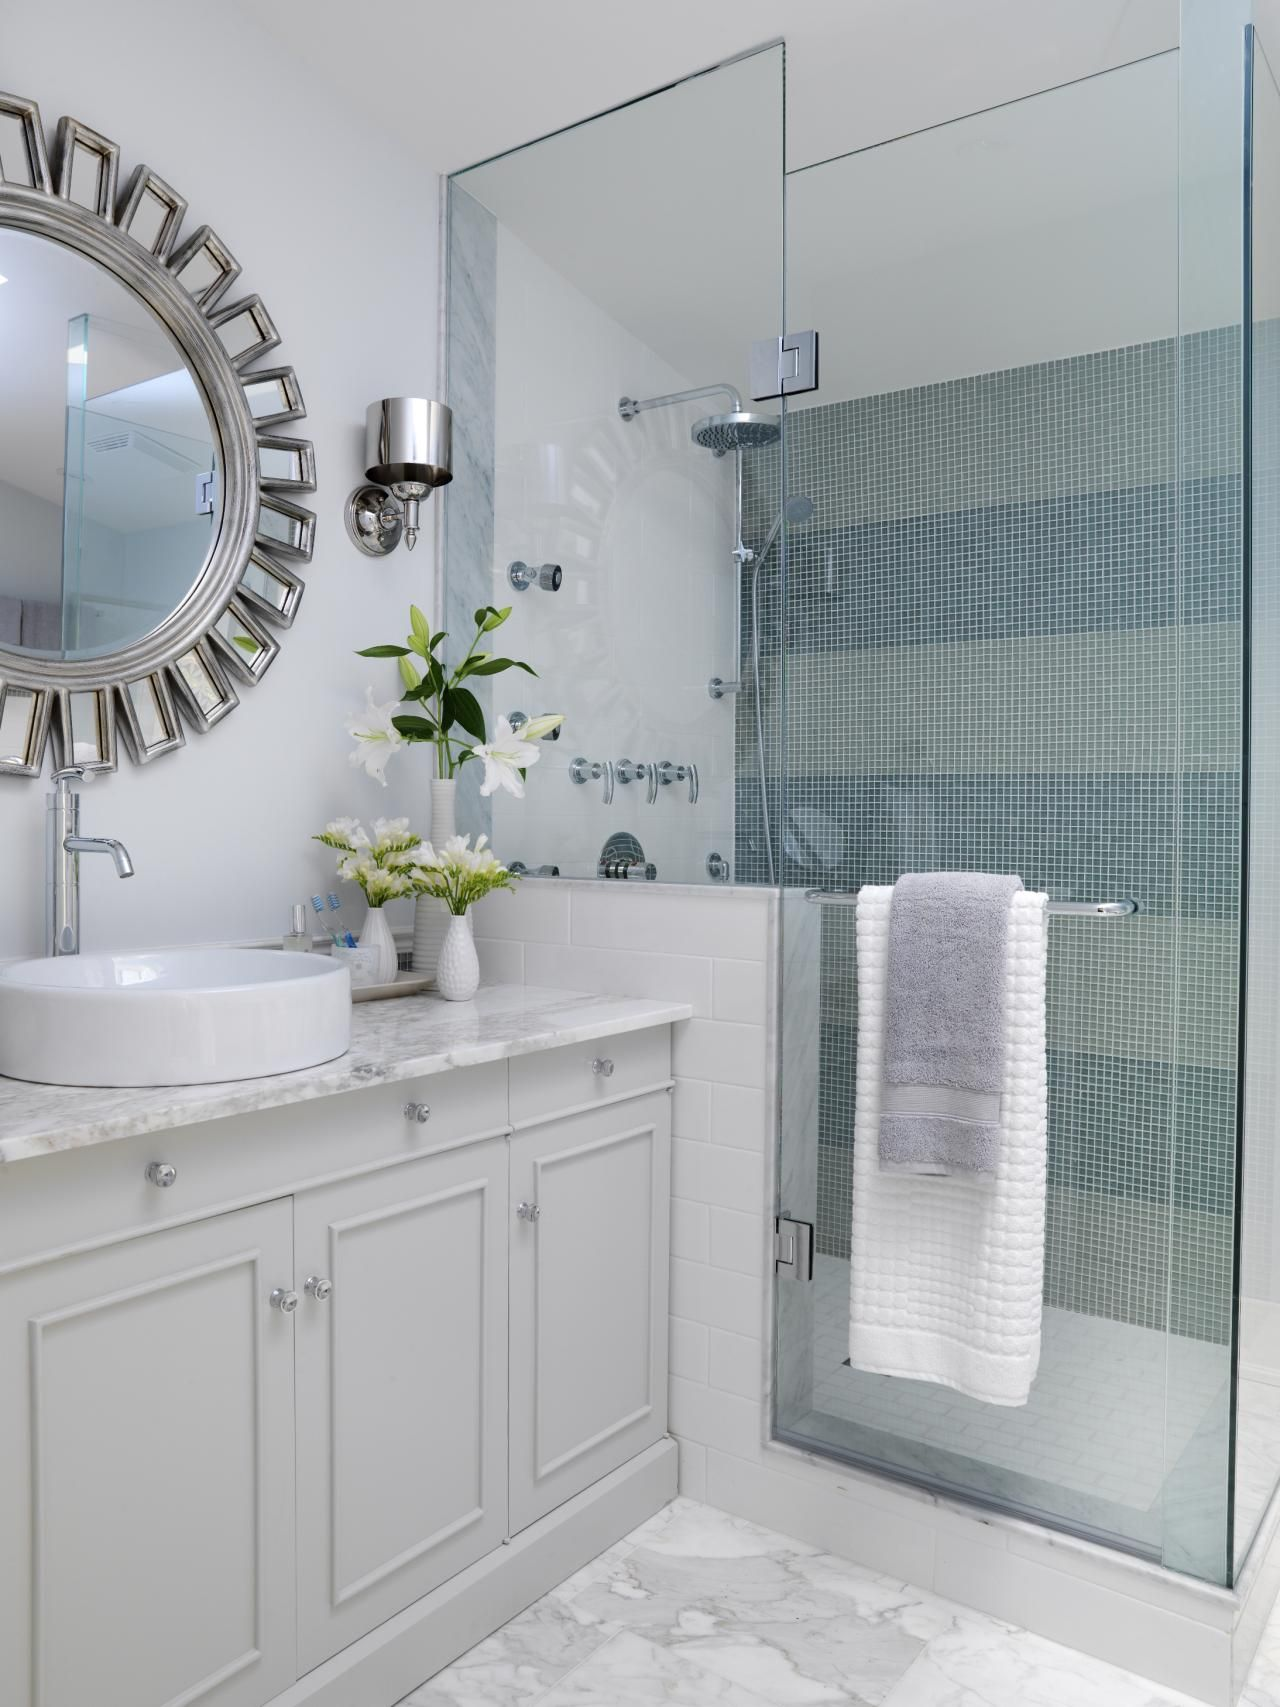 Photo Page Photo Library Hgtv Bathroom Tile Designs Bathroom Design Small Bathroom Trends